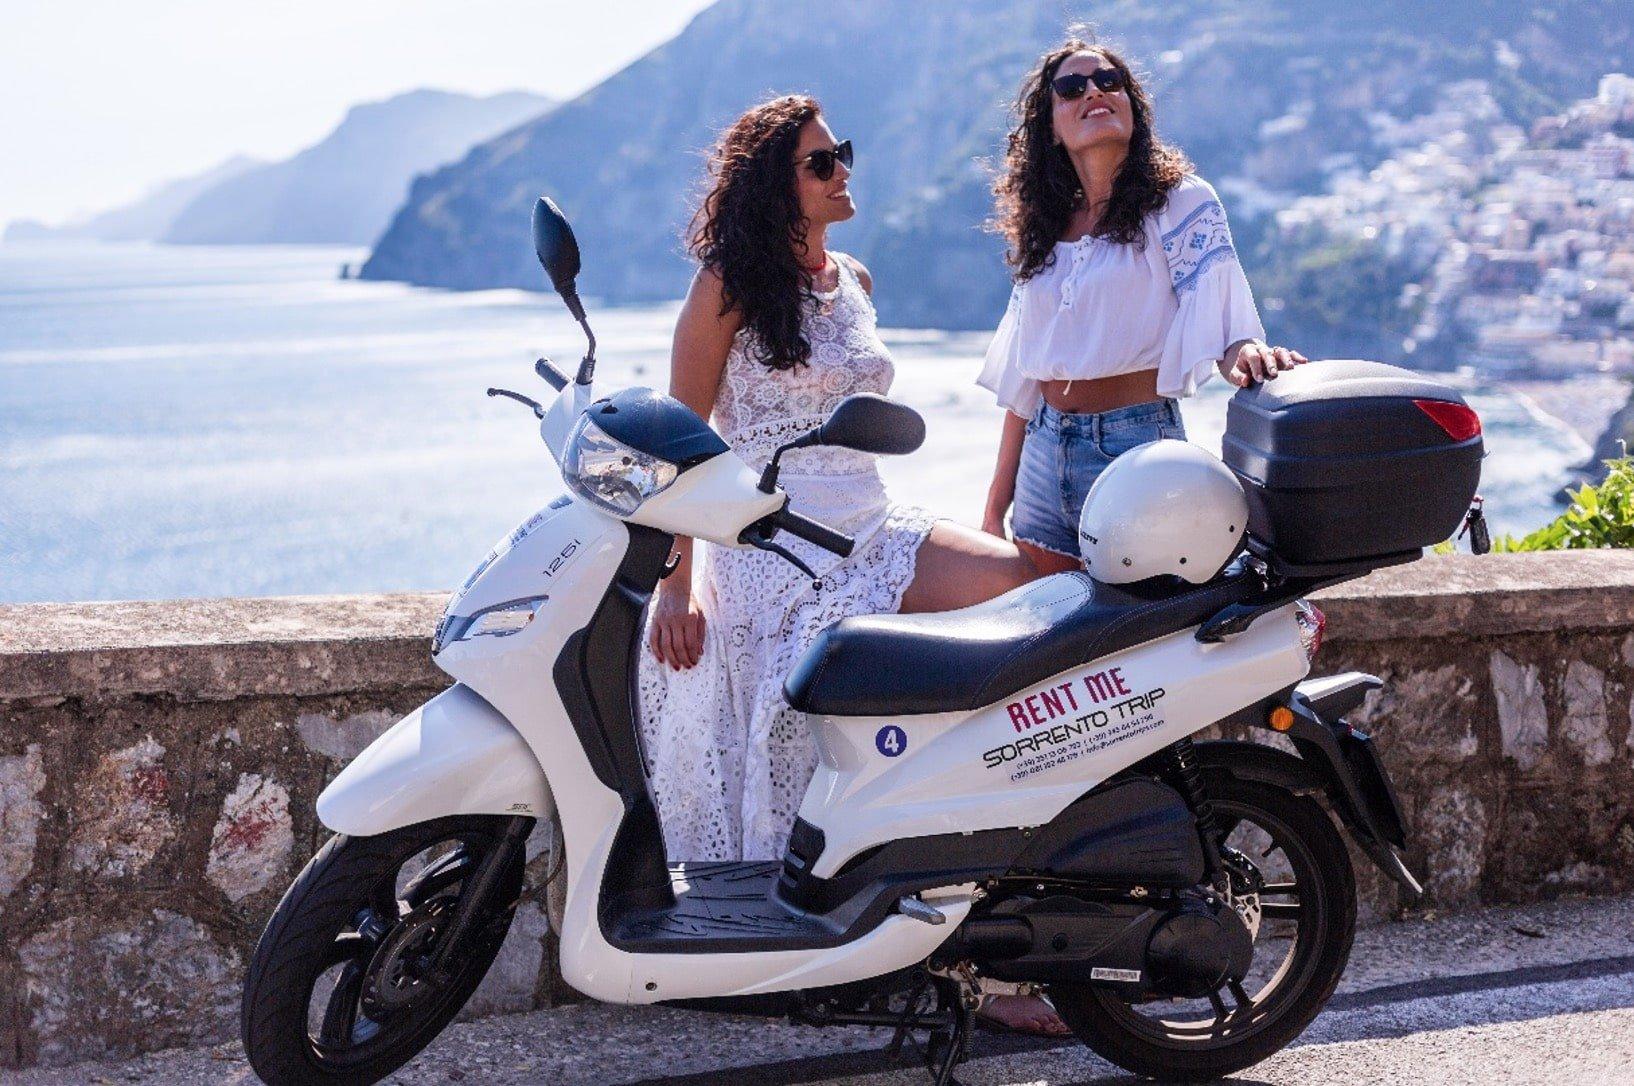 Vantaggi del noleggio scooter ad Amalfi